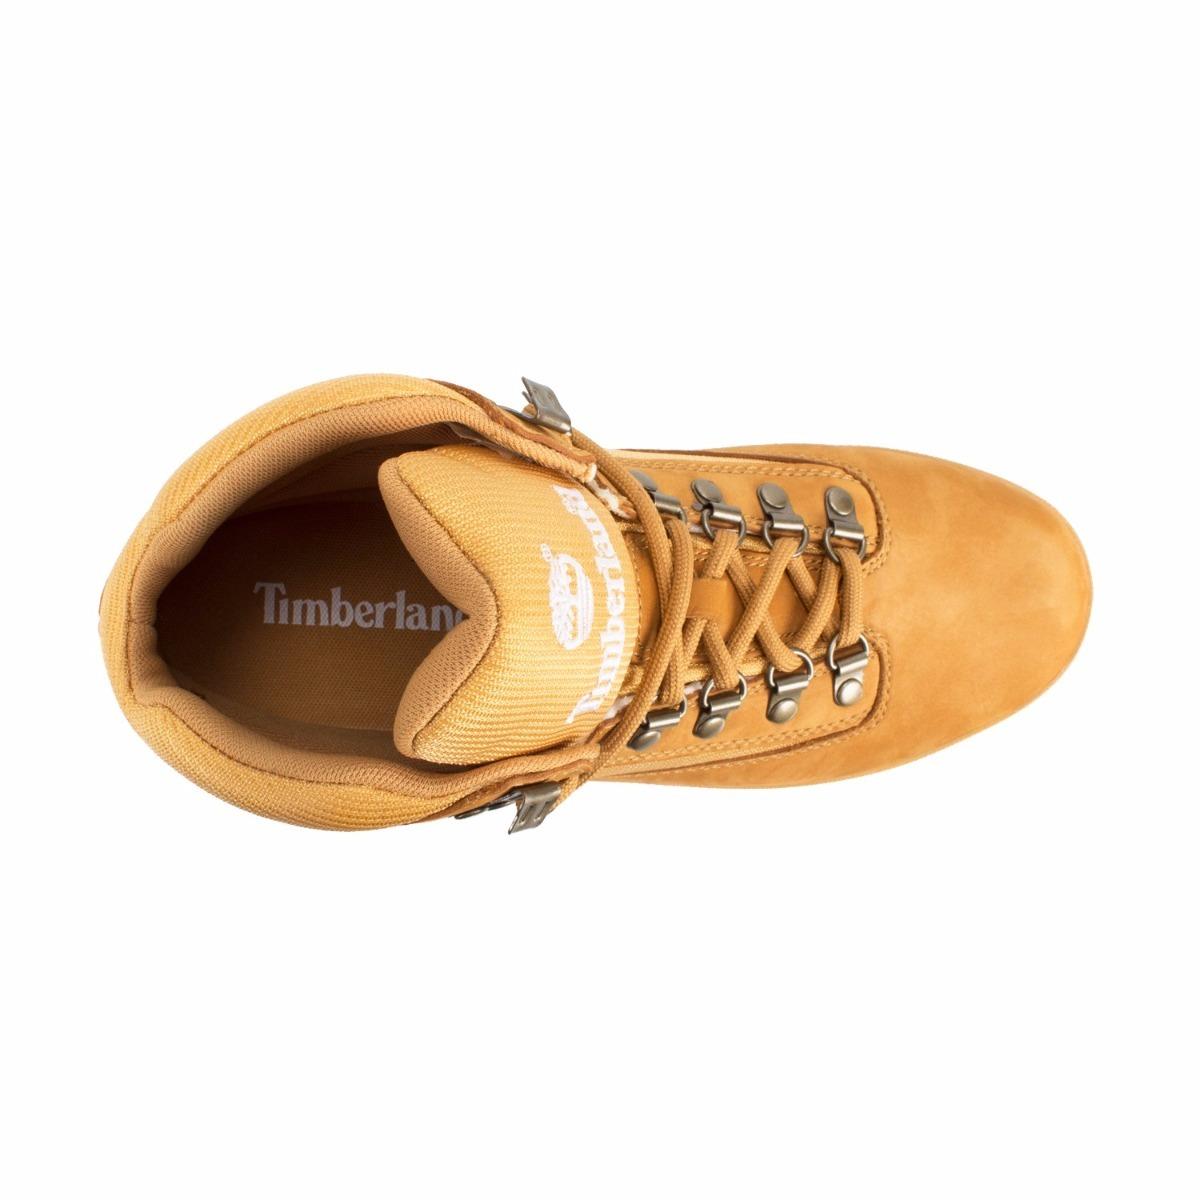 a1cfeec680dcd botas timberland para caballero color amarillo piel id126. Cargando zoom.